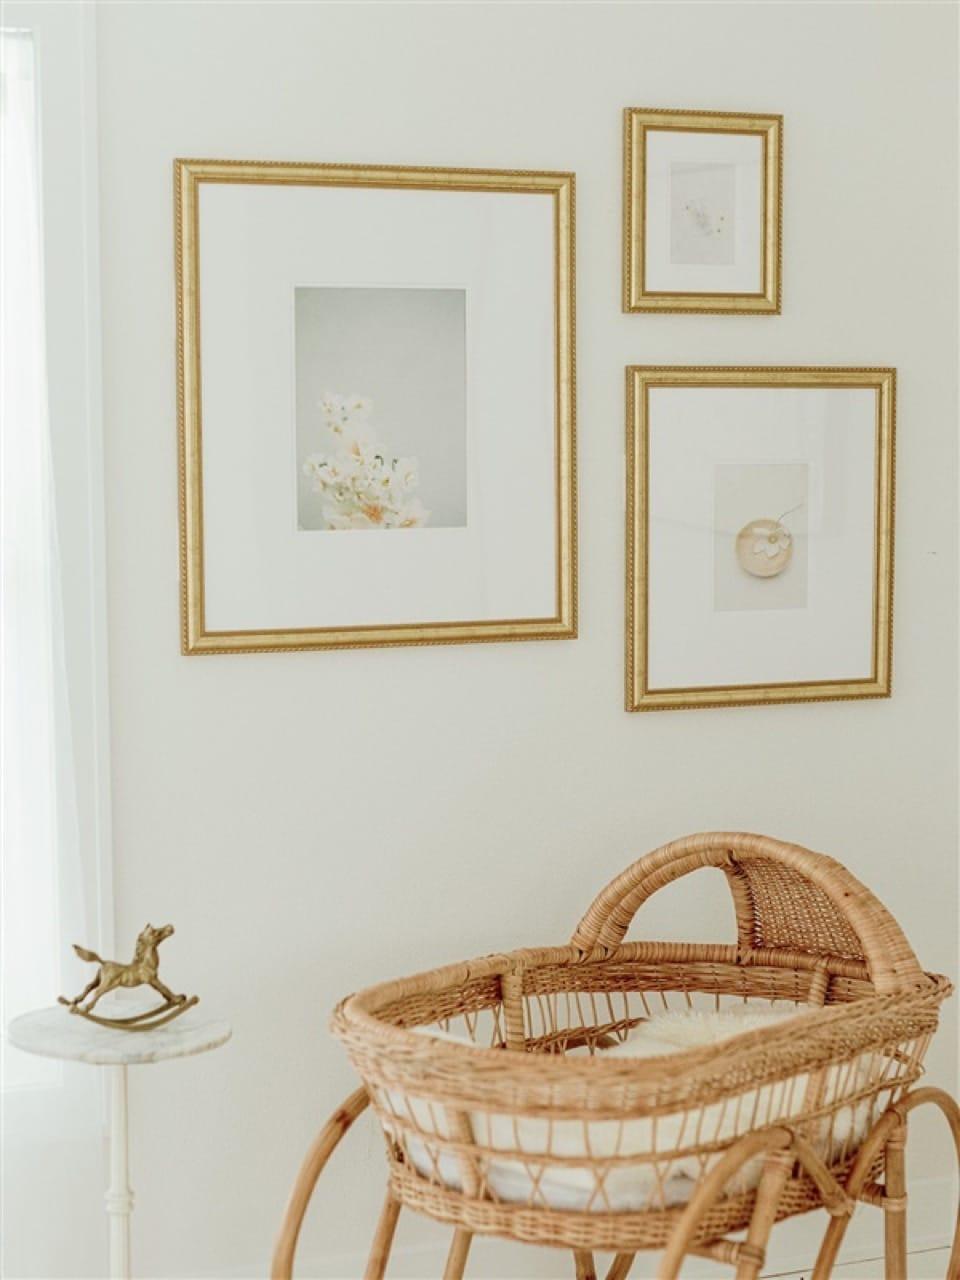 Granby gold frames